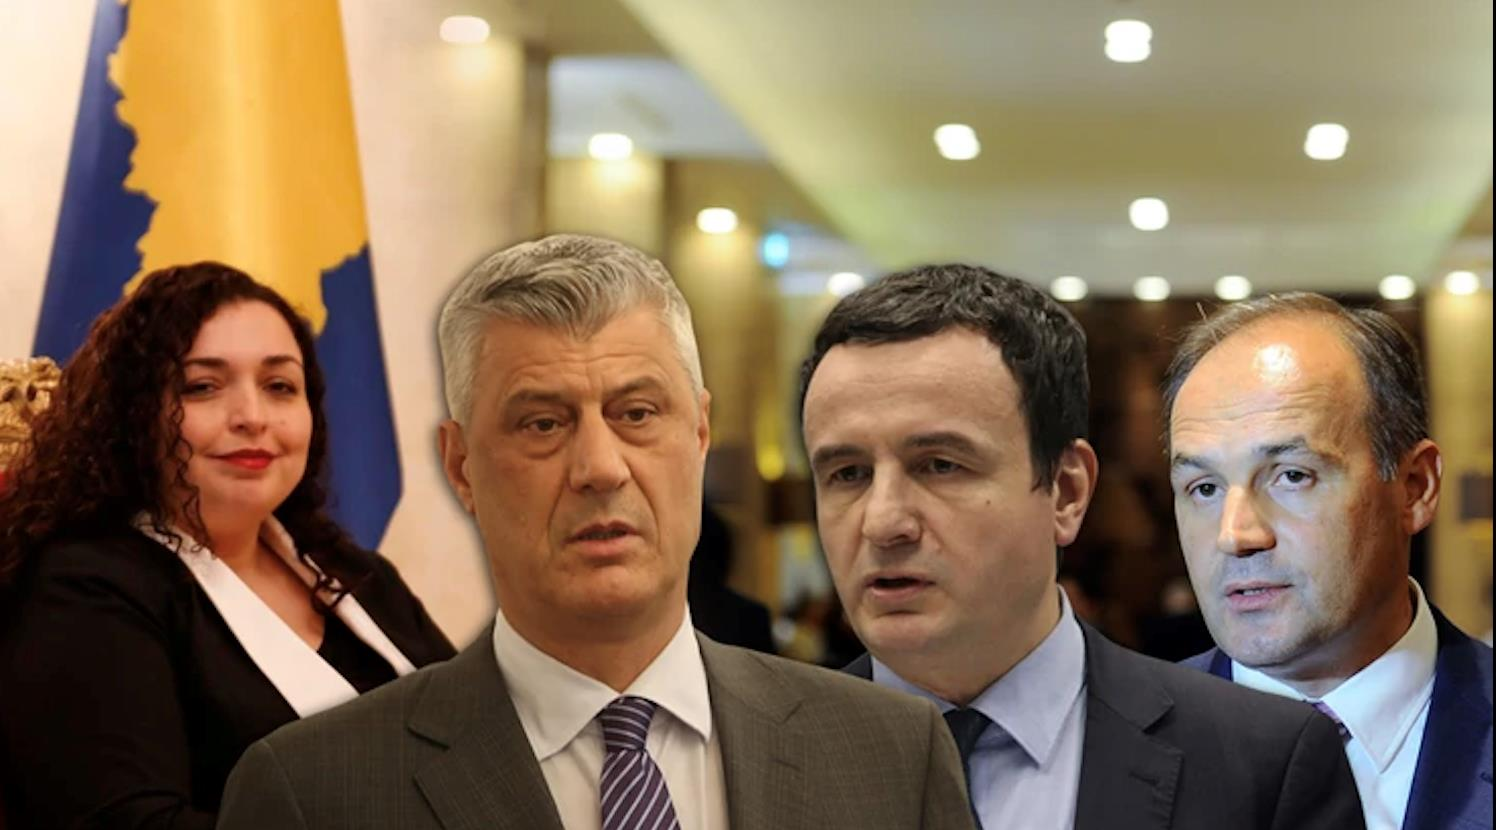 Kosovo: Poznati protagonisti prevremenih kosovskih izbora, ali datum tek treba da bude utvrđen